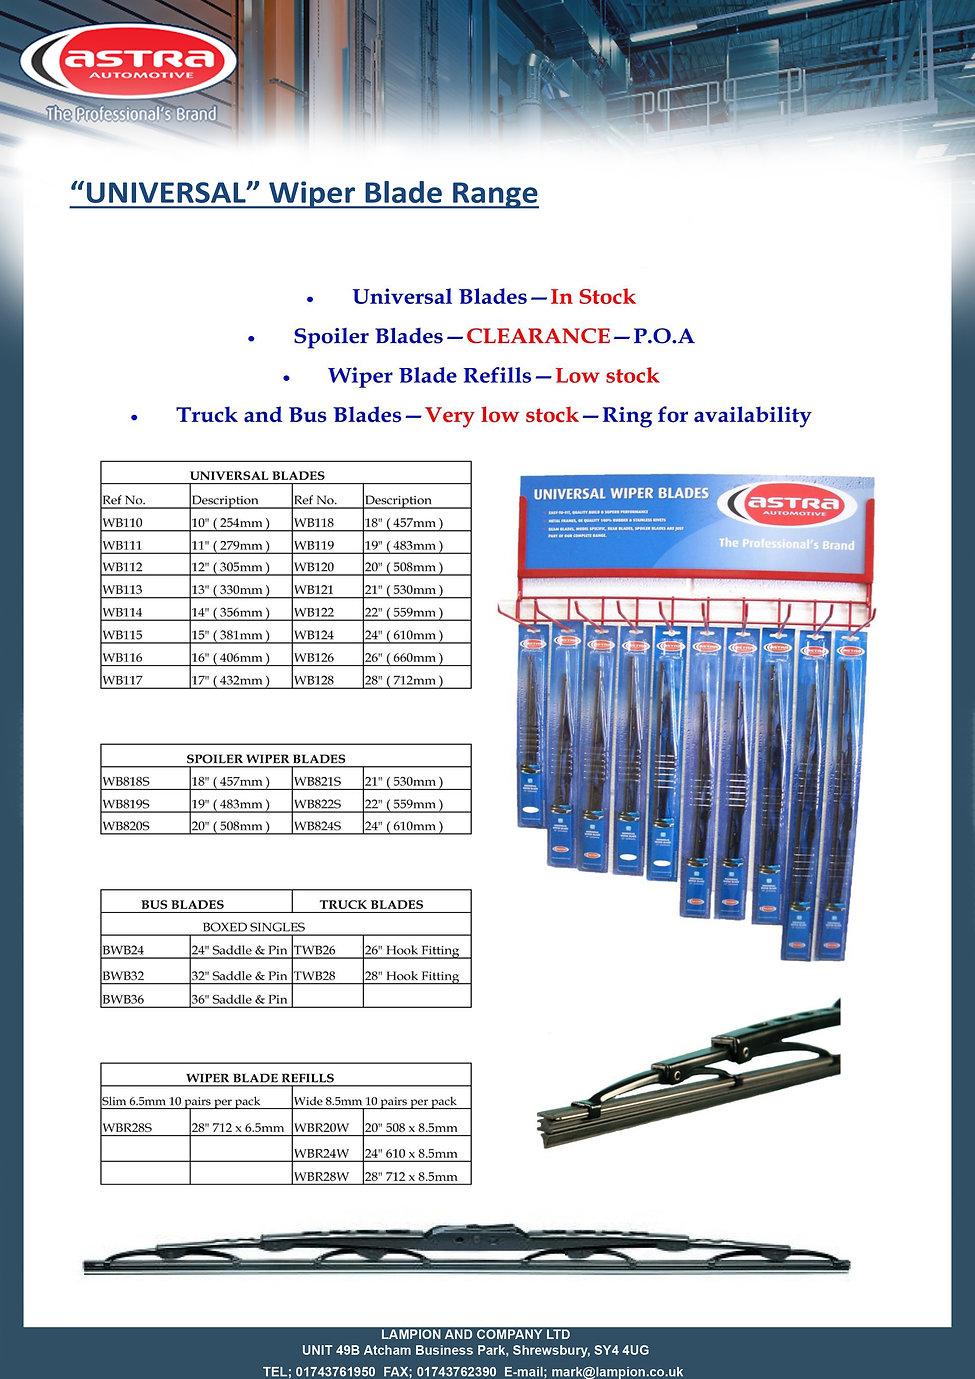 Wiper 2 copy.jpg